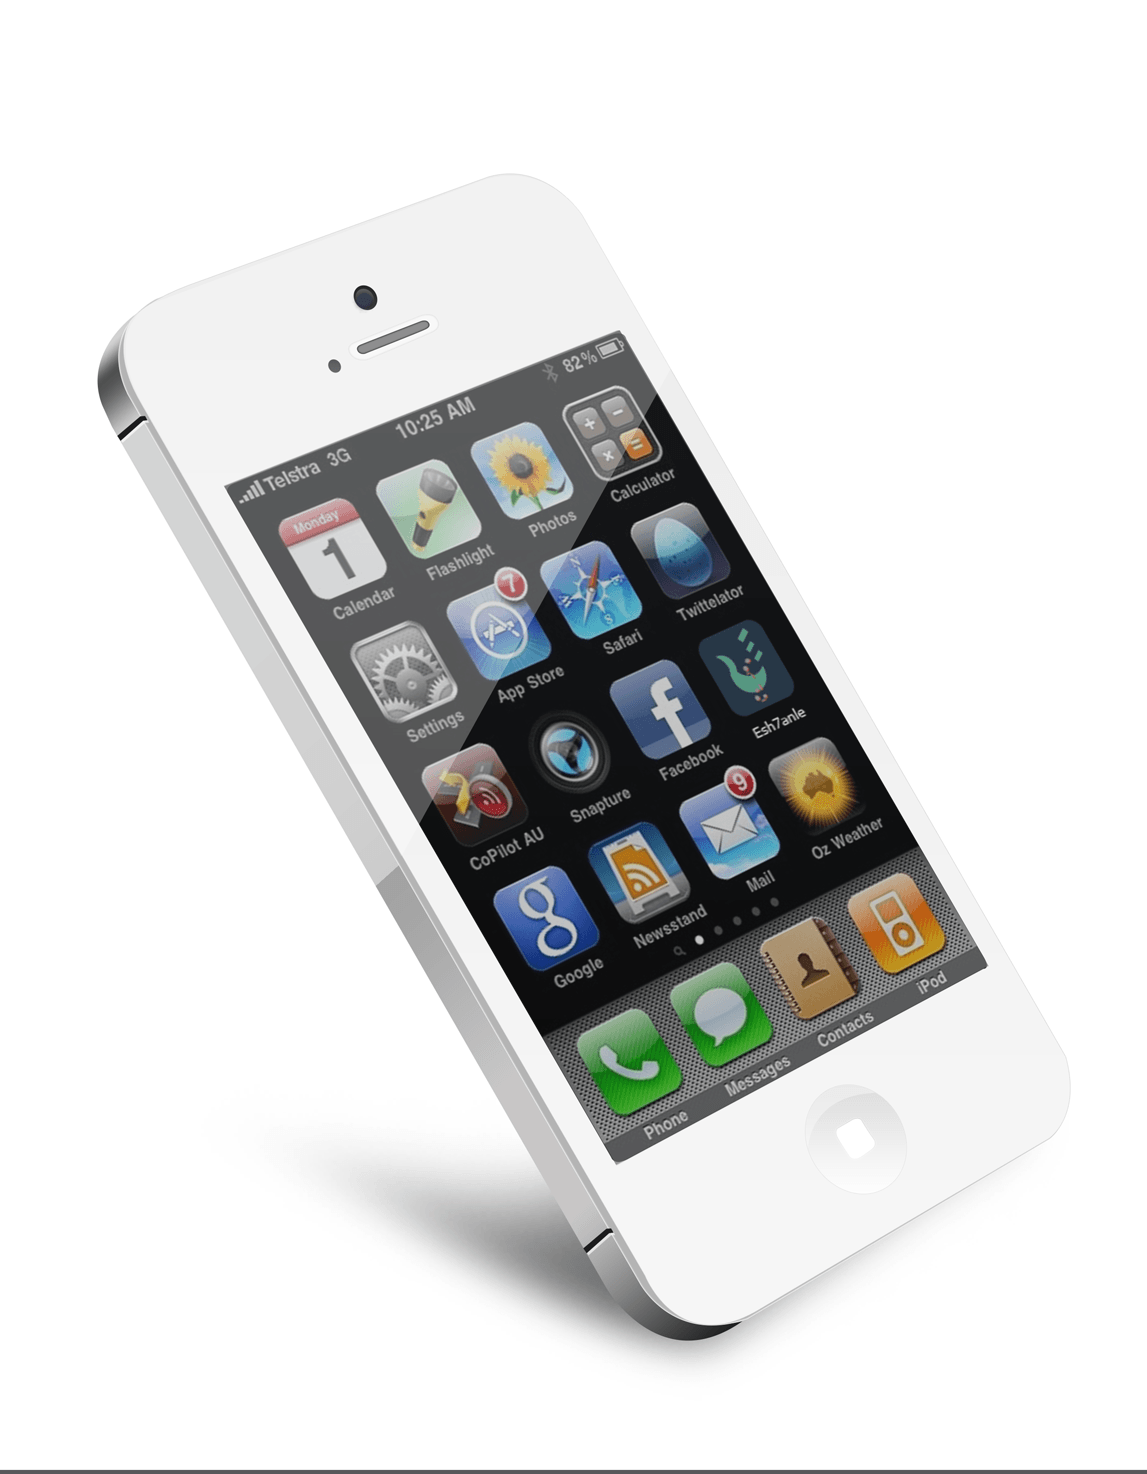 esh7anle final iphone app icon